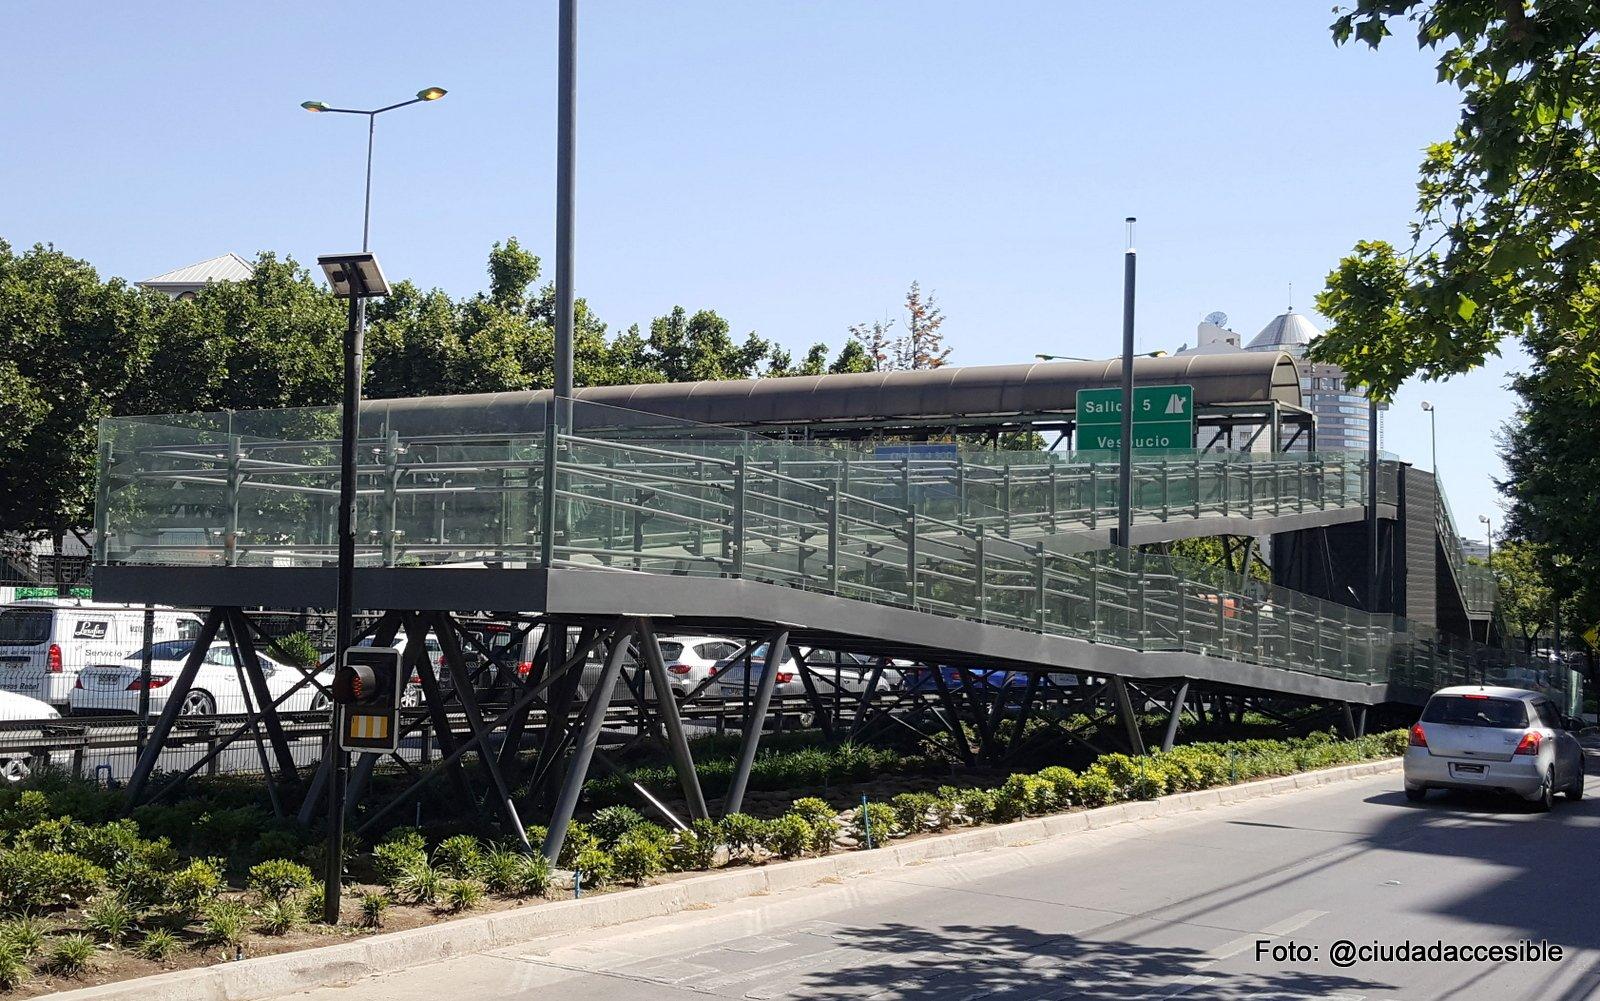 termino de construcción de rampa en pasarela peatonal noviembre de 2017